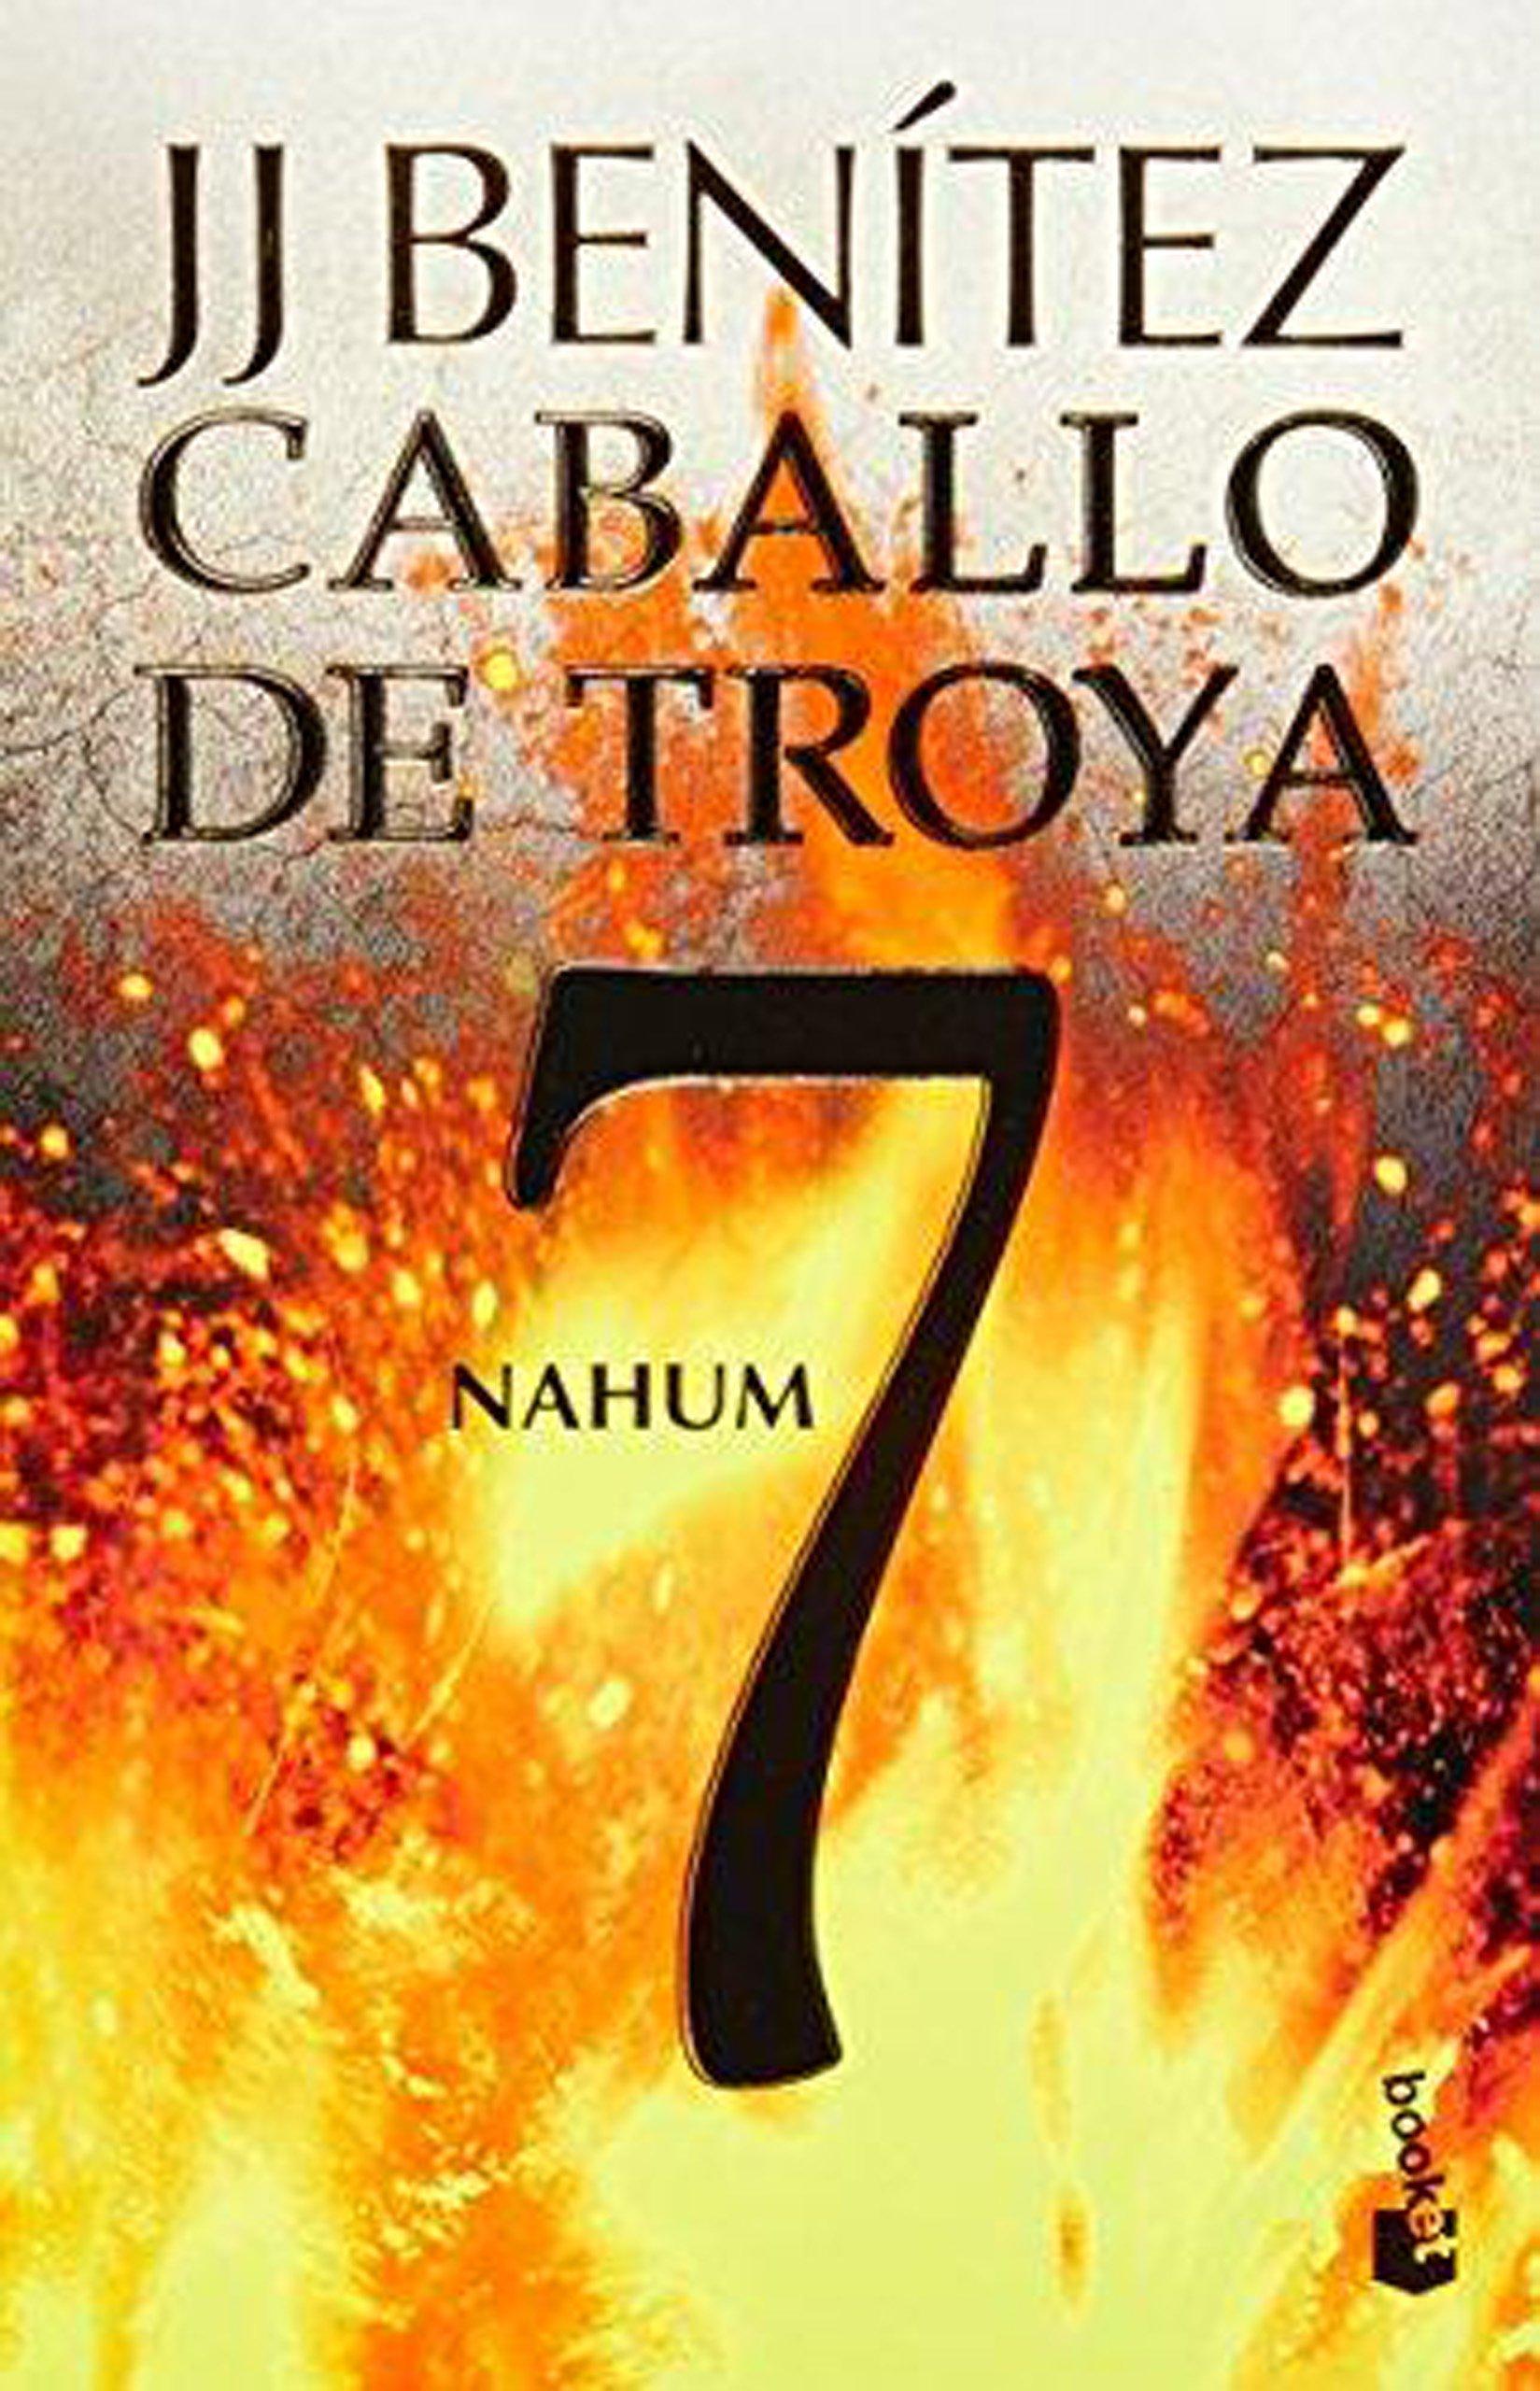 Caballo de Troya 7 (Nueva edic.): 1:J. J. Benítez: Amazon.com.mx: Libros